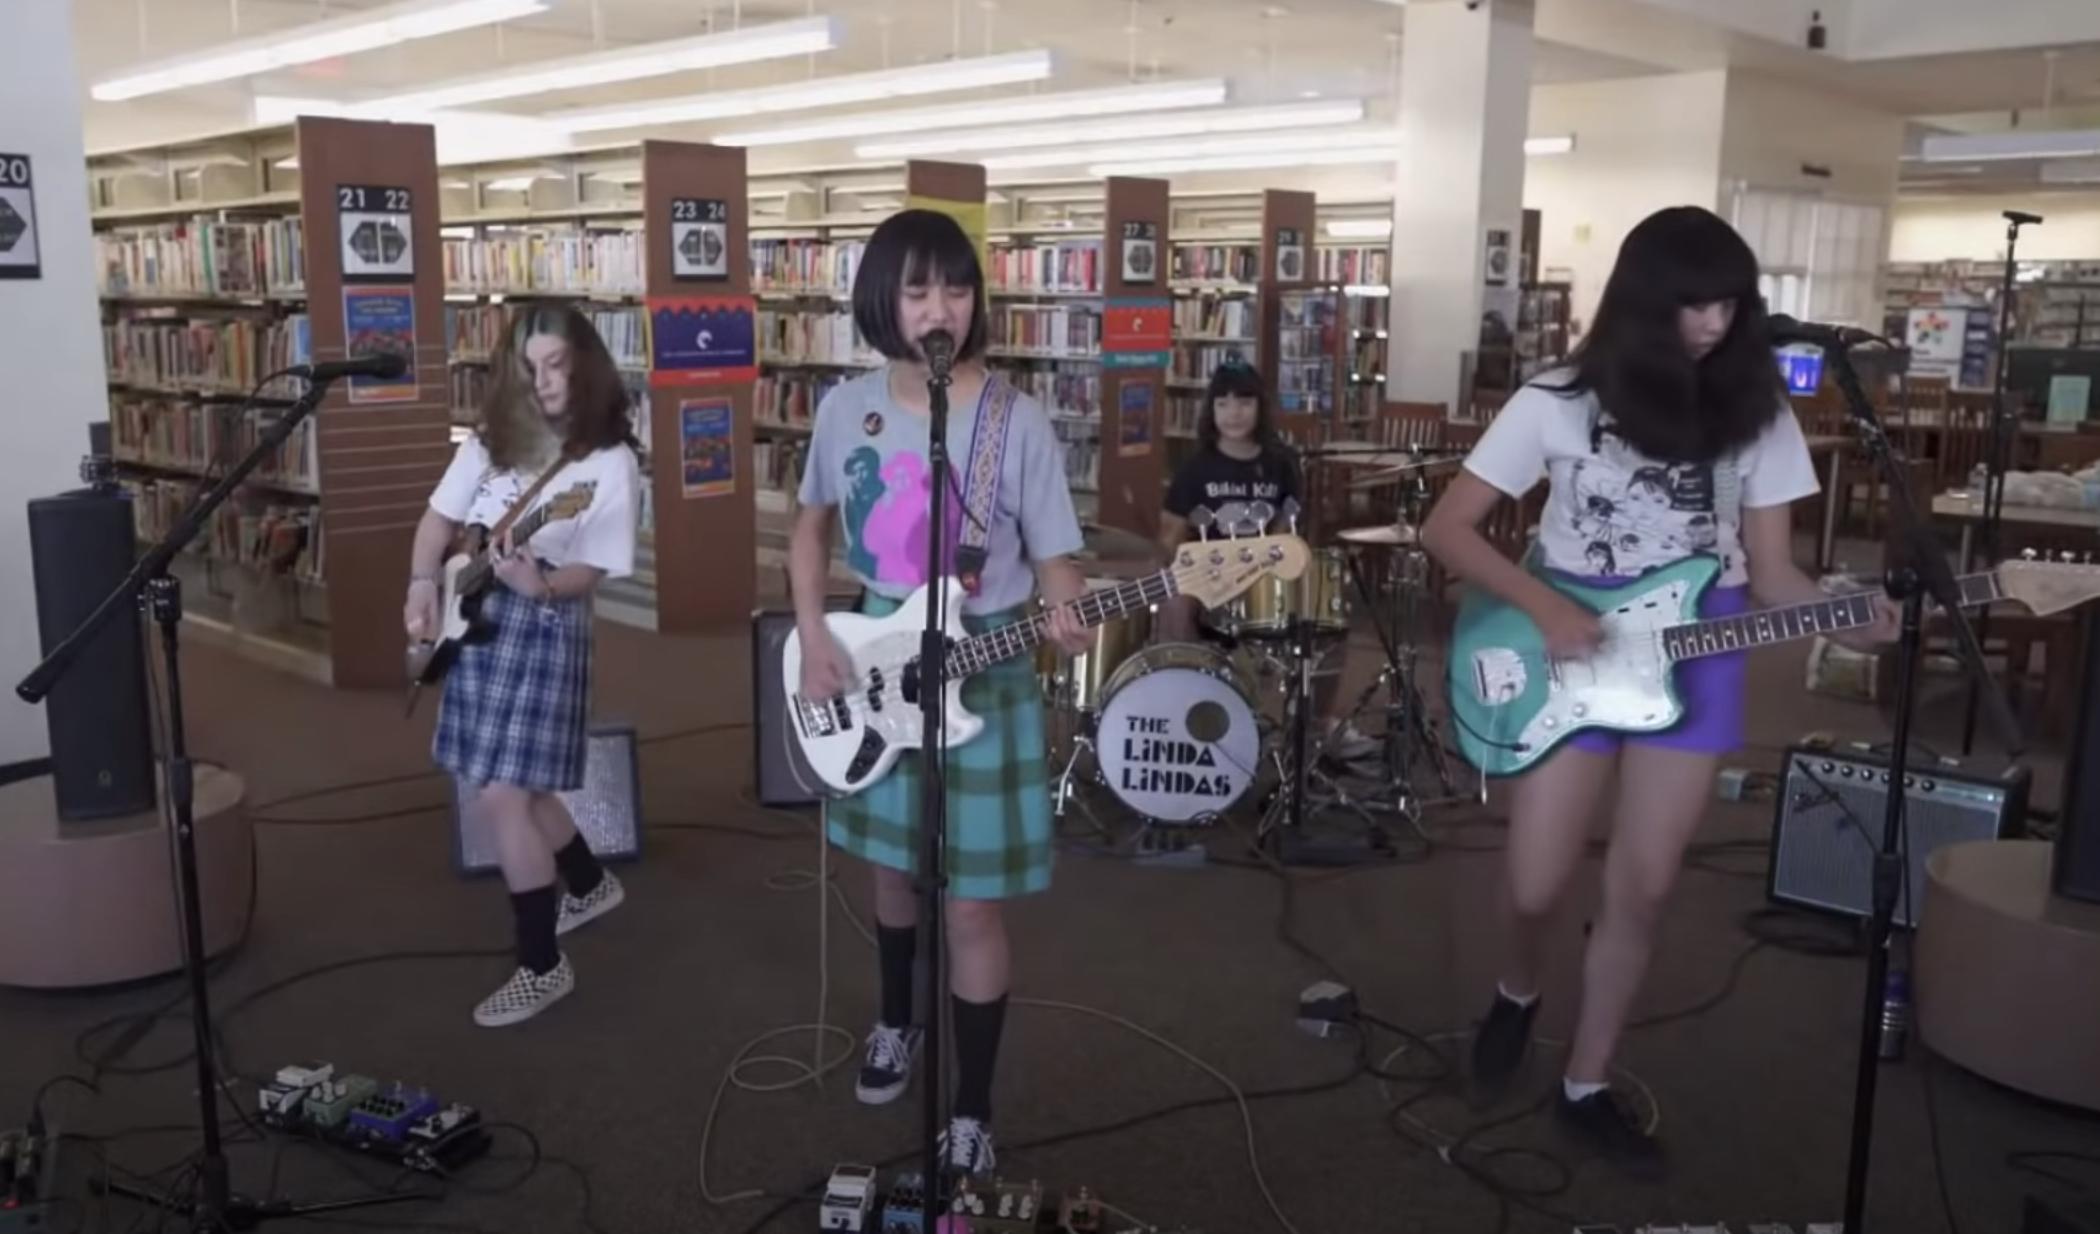 Banda Viral de Teen Punk, el cartel de Linda Lindas con Epitaph Records